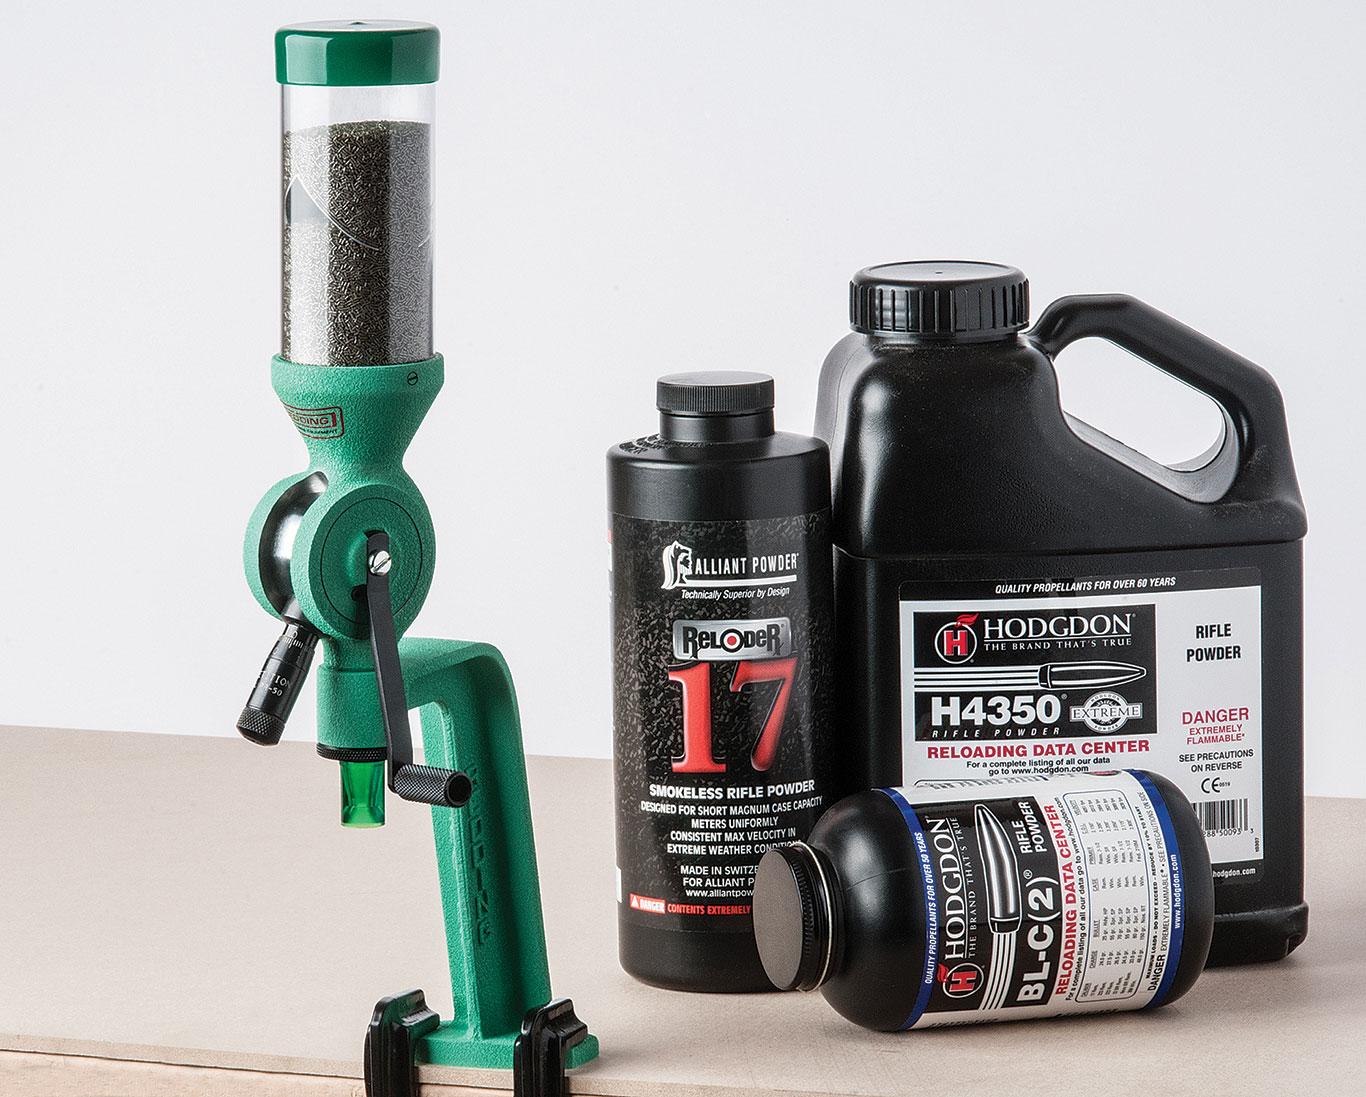 Redding's PR-50 volumetric measure provides benchrest-grade consistency with most propellant granule types.